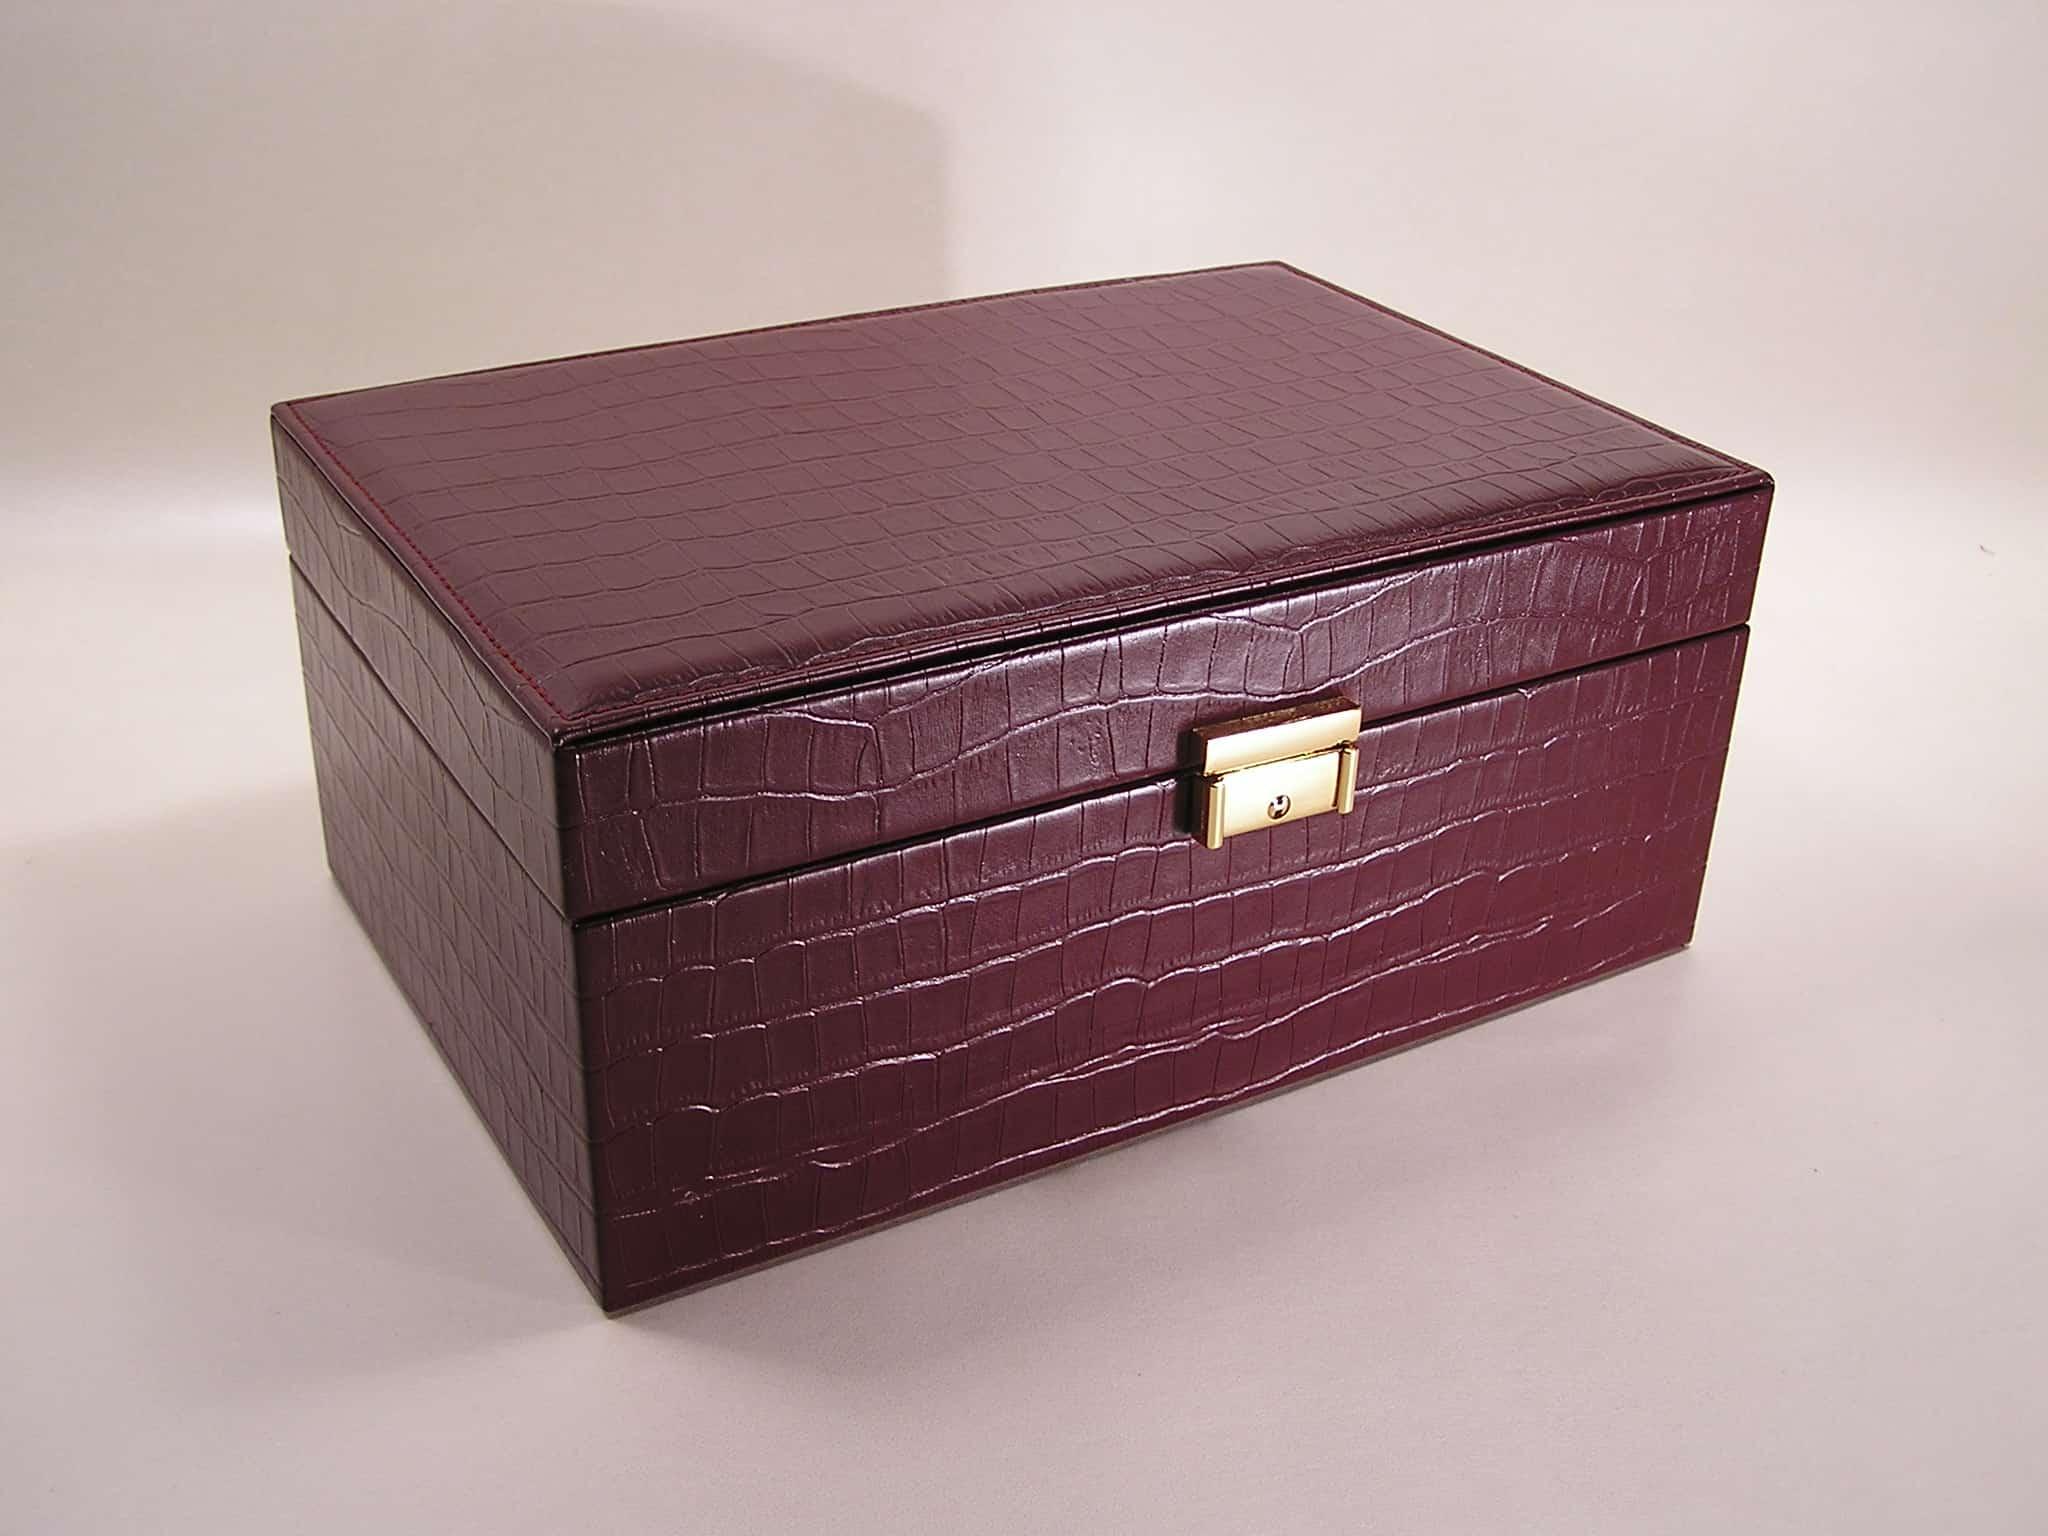 jewelery box real leather crocodile print